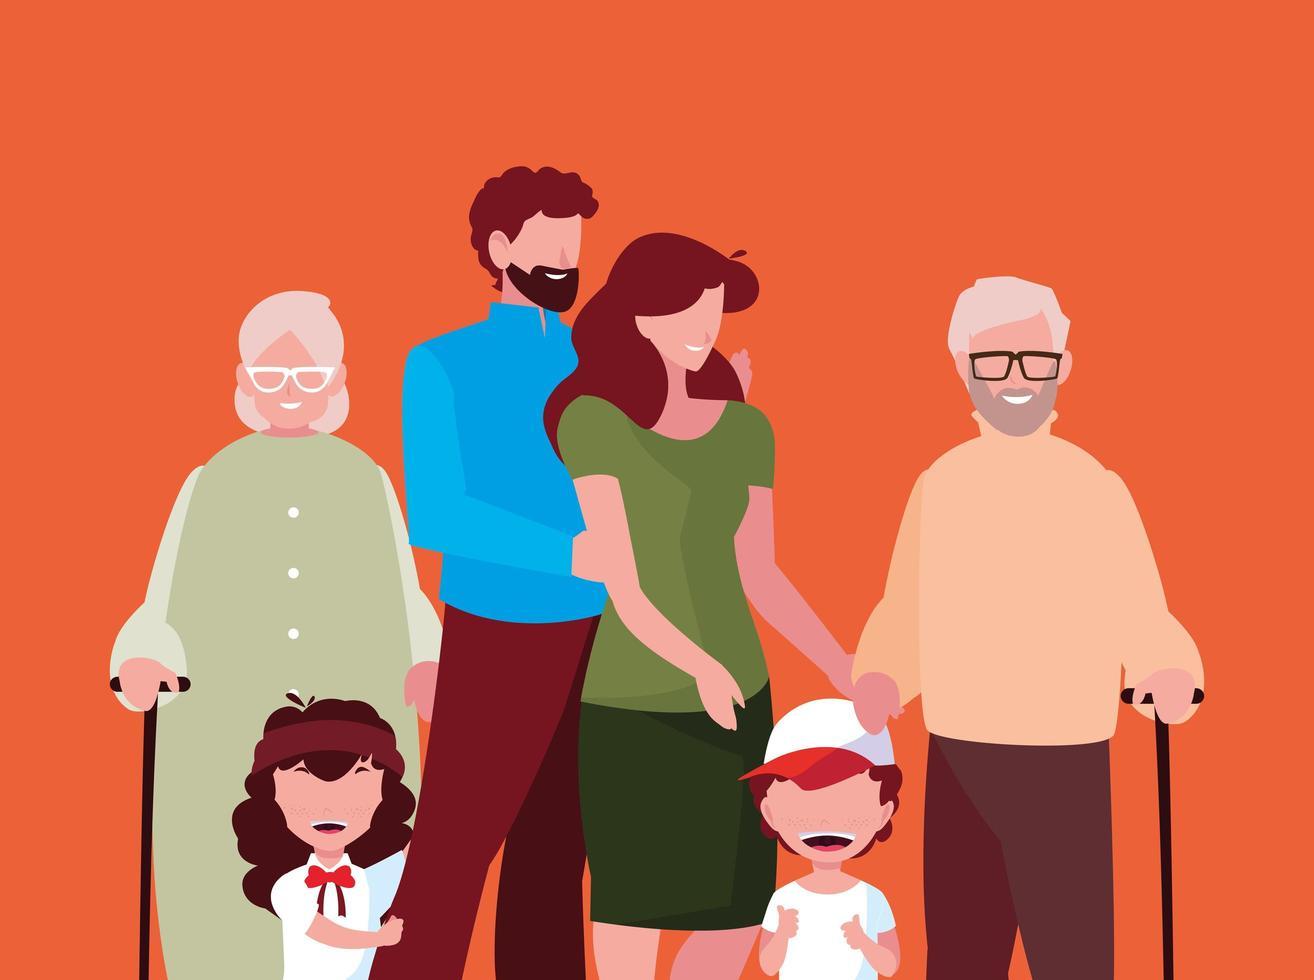 Familienmitglieder Charaktere vektor